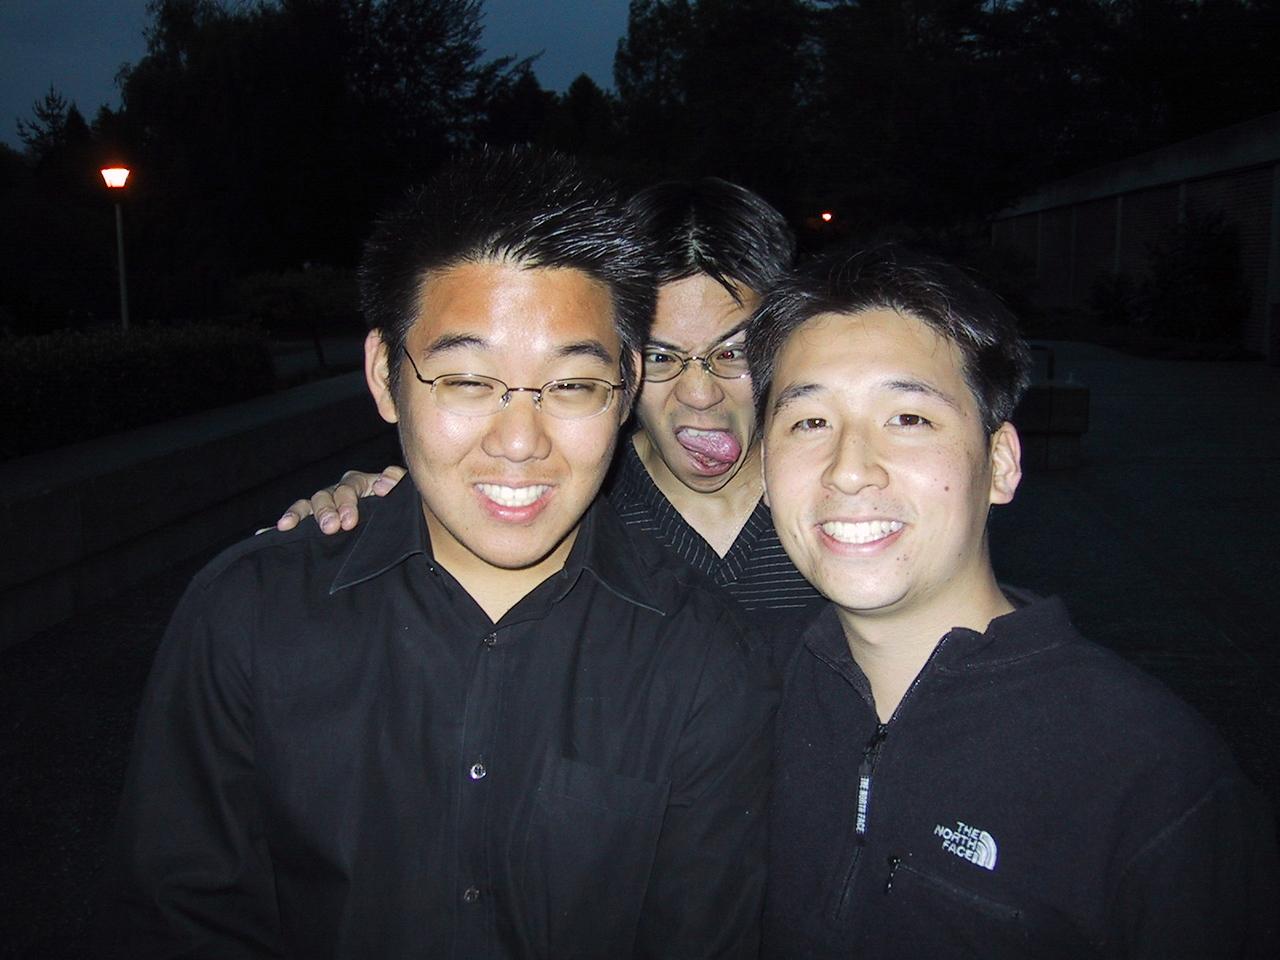 AiR Spring 2002 Sonoma St gig - Ben beautifies Kenji & Lenny